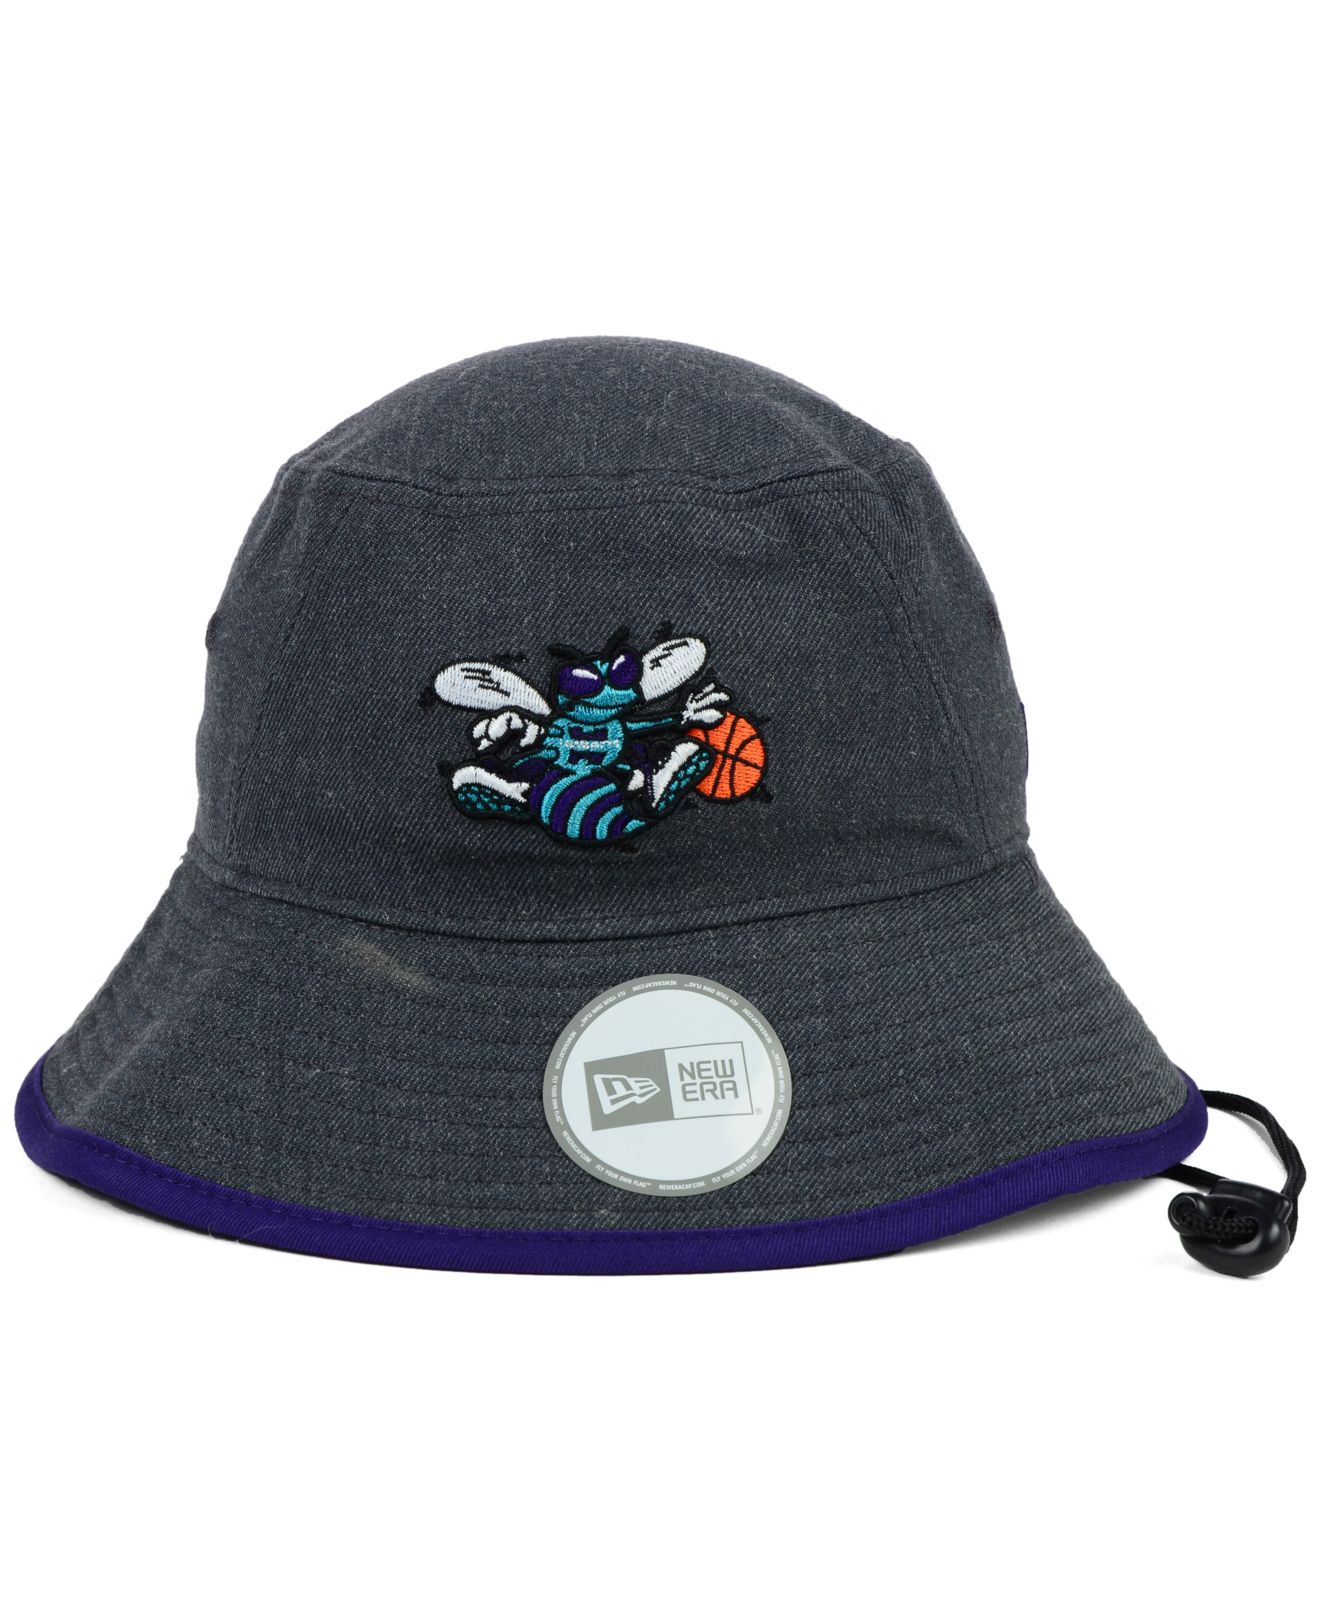 7c721cce0ff Lyst - KTZ Charlotte Hornets Dark Heather Tipped Bucket Hat in Gray ...